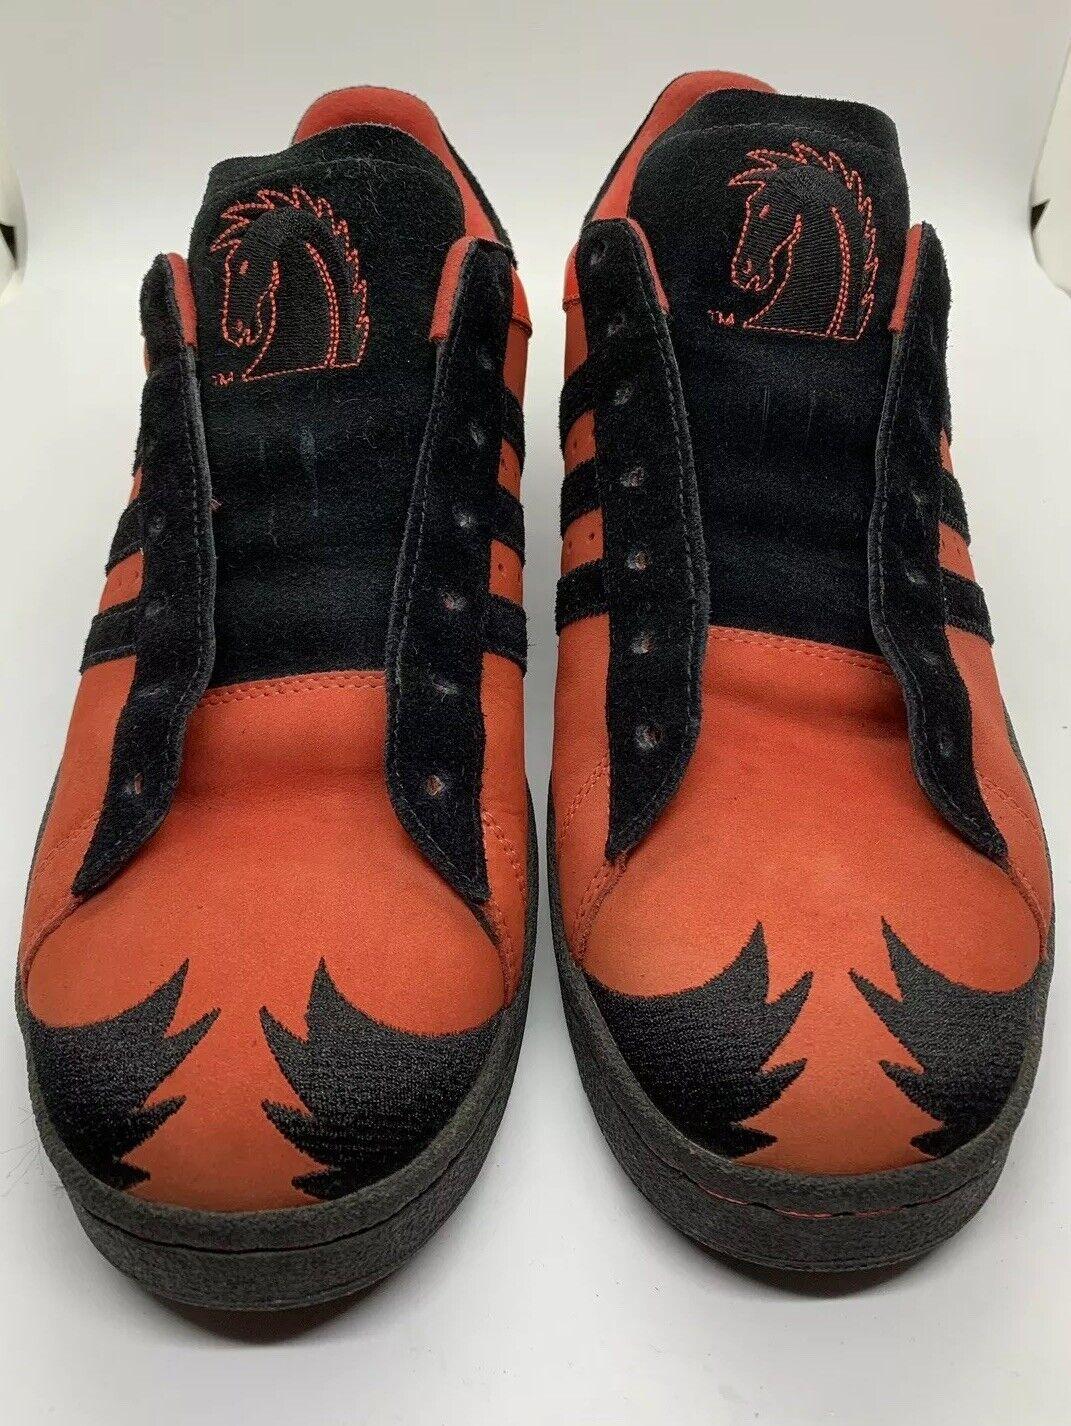 Adidas Adicolor Century Low Sneakers Men's Size 10.5